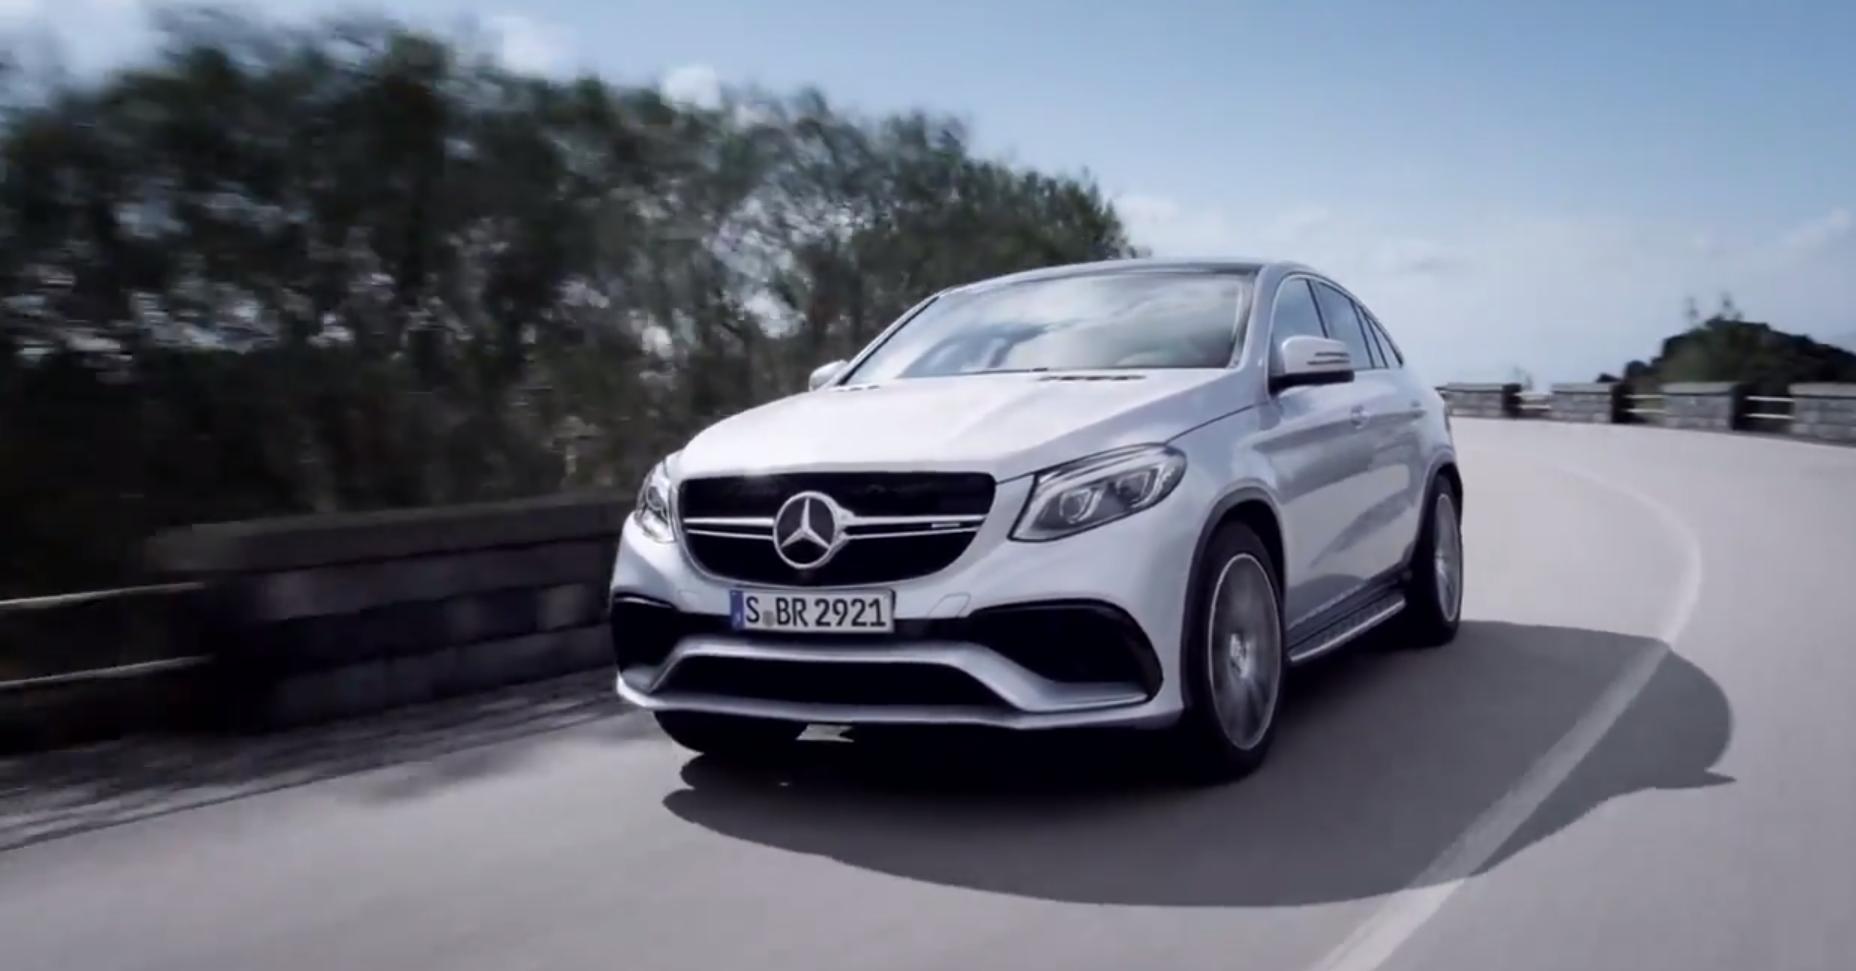 Mercedes Gle Coupe >> Mercedes-AMG GLE 63 Coupe revealed - photos | CarAdvice